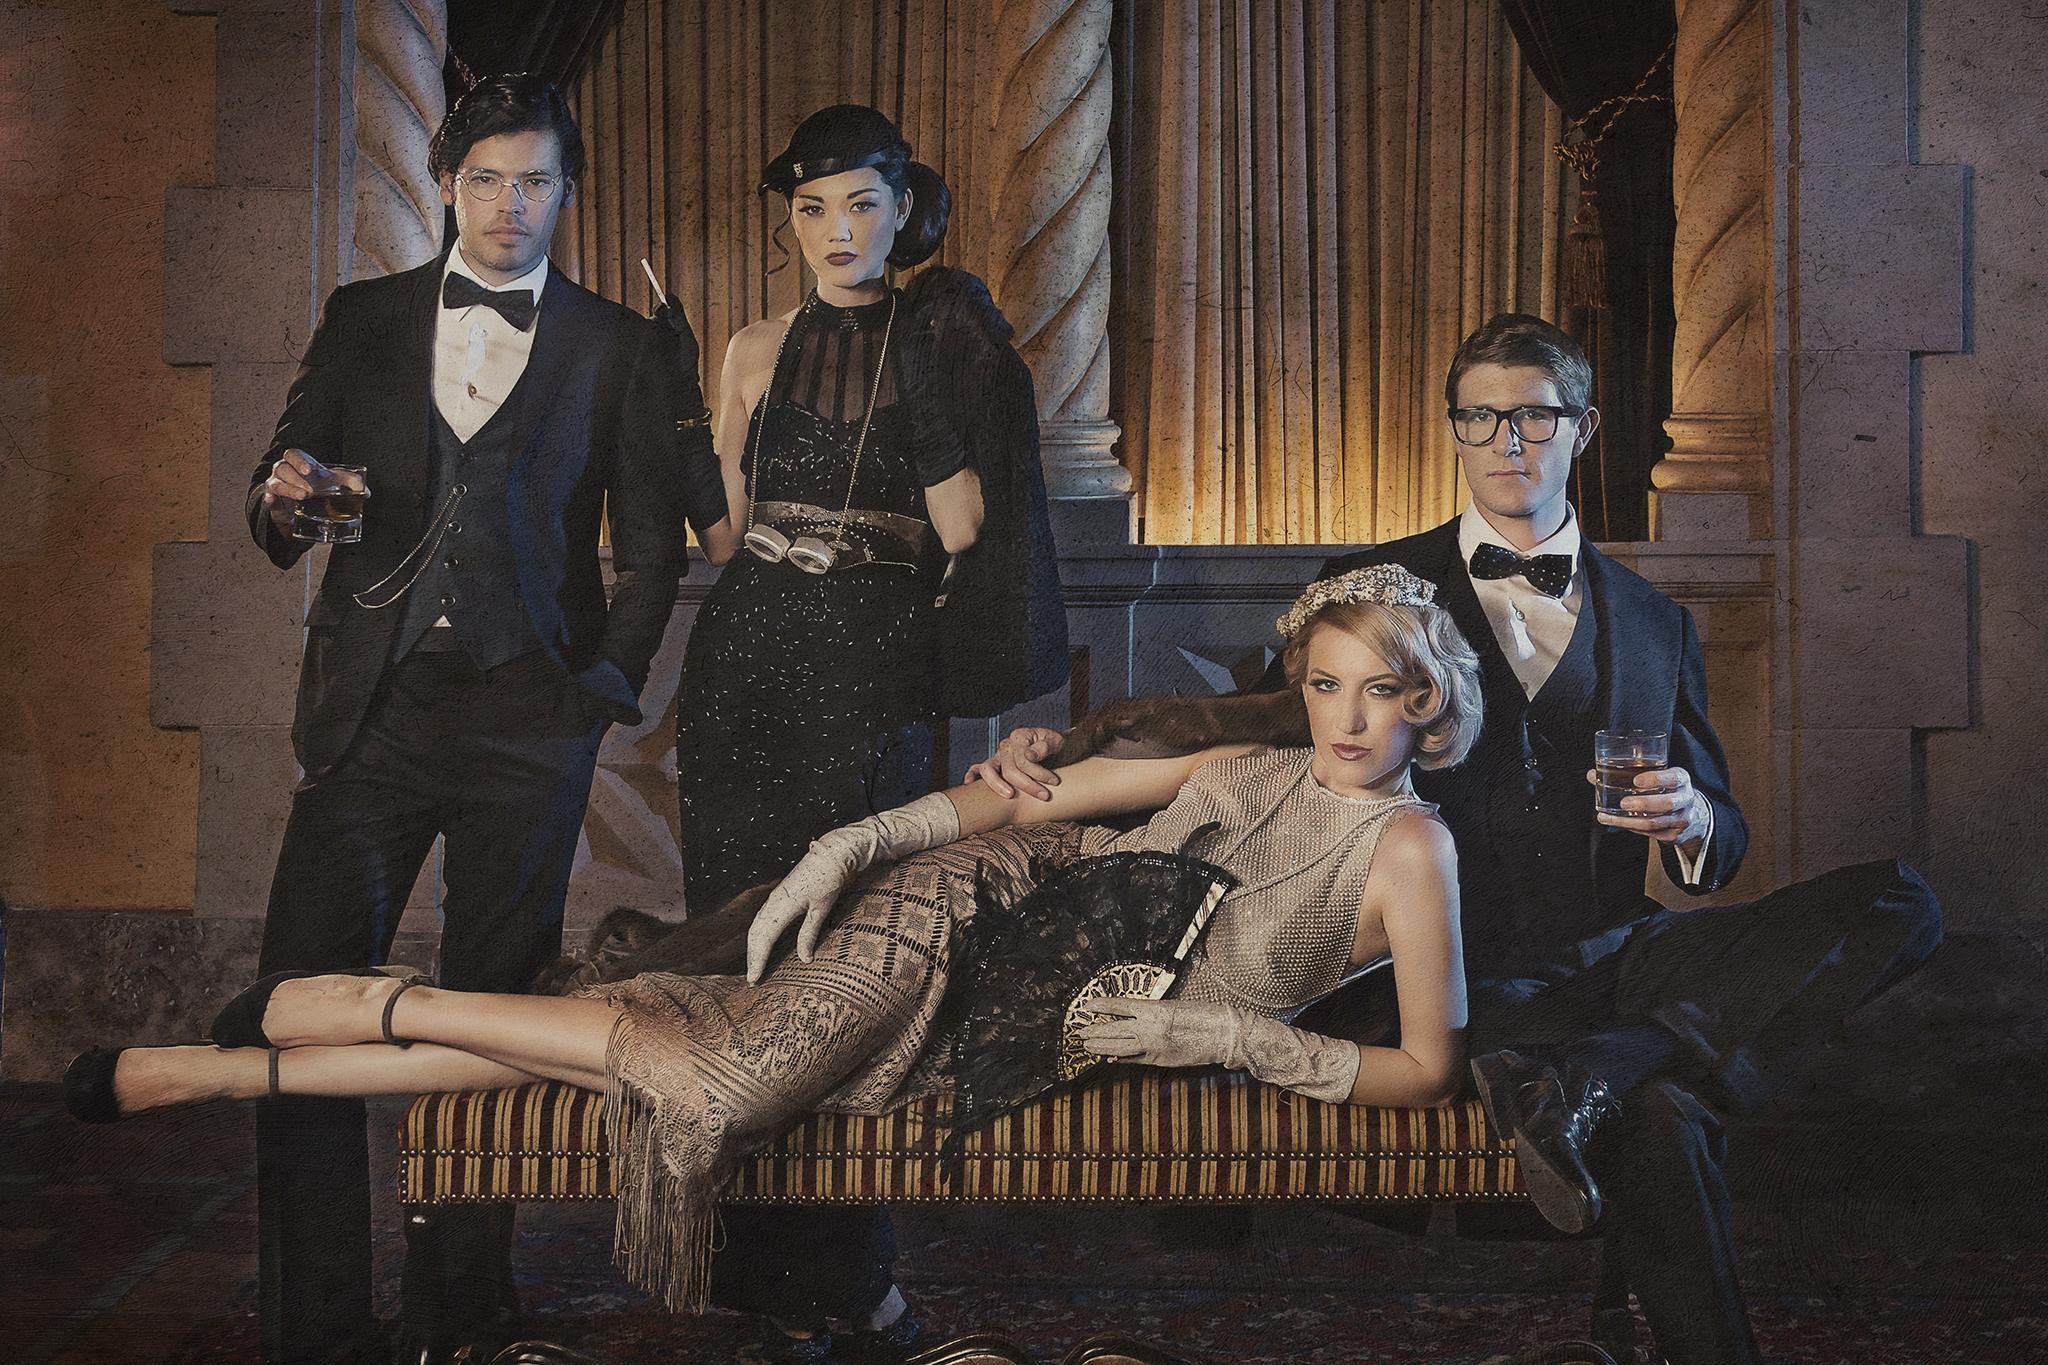 Great Gatsy Group photo